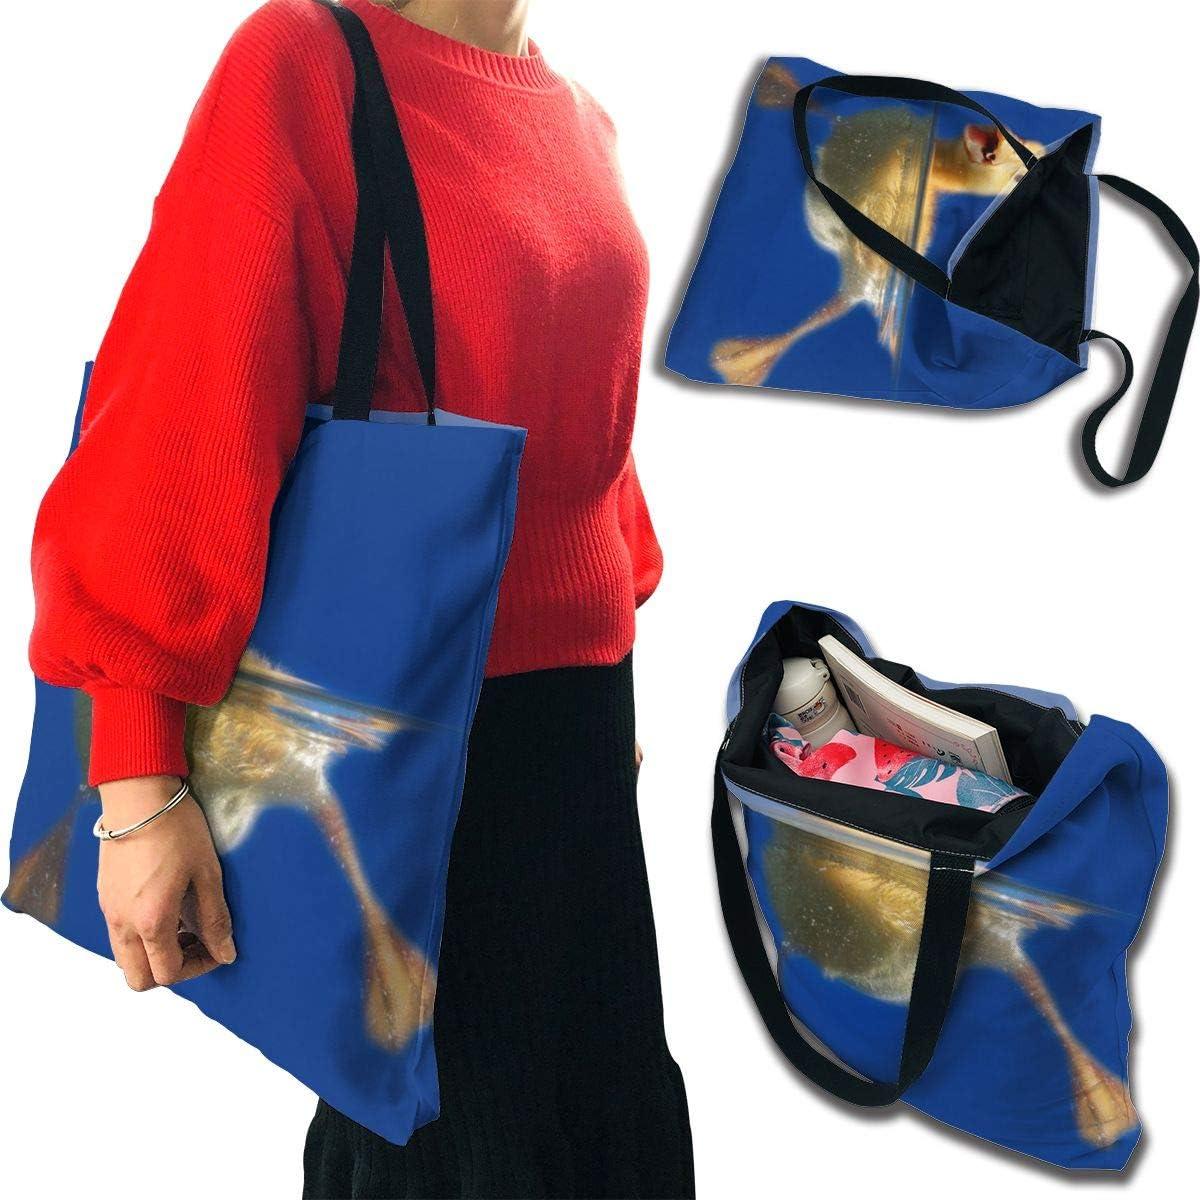 PengMin Duck On Water Fashion Womens Multi-Pocket Vintage Canvas Handbags Miniature Shoulder Bags Totes Purses Shopping Bags